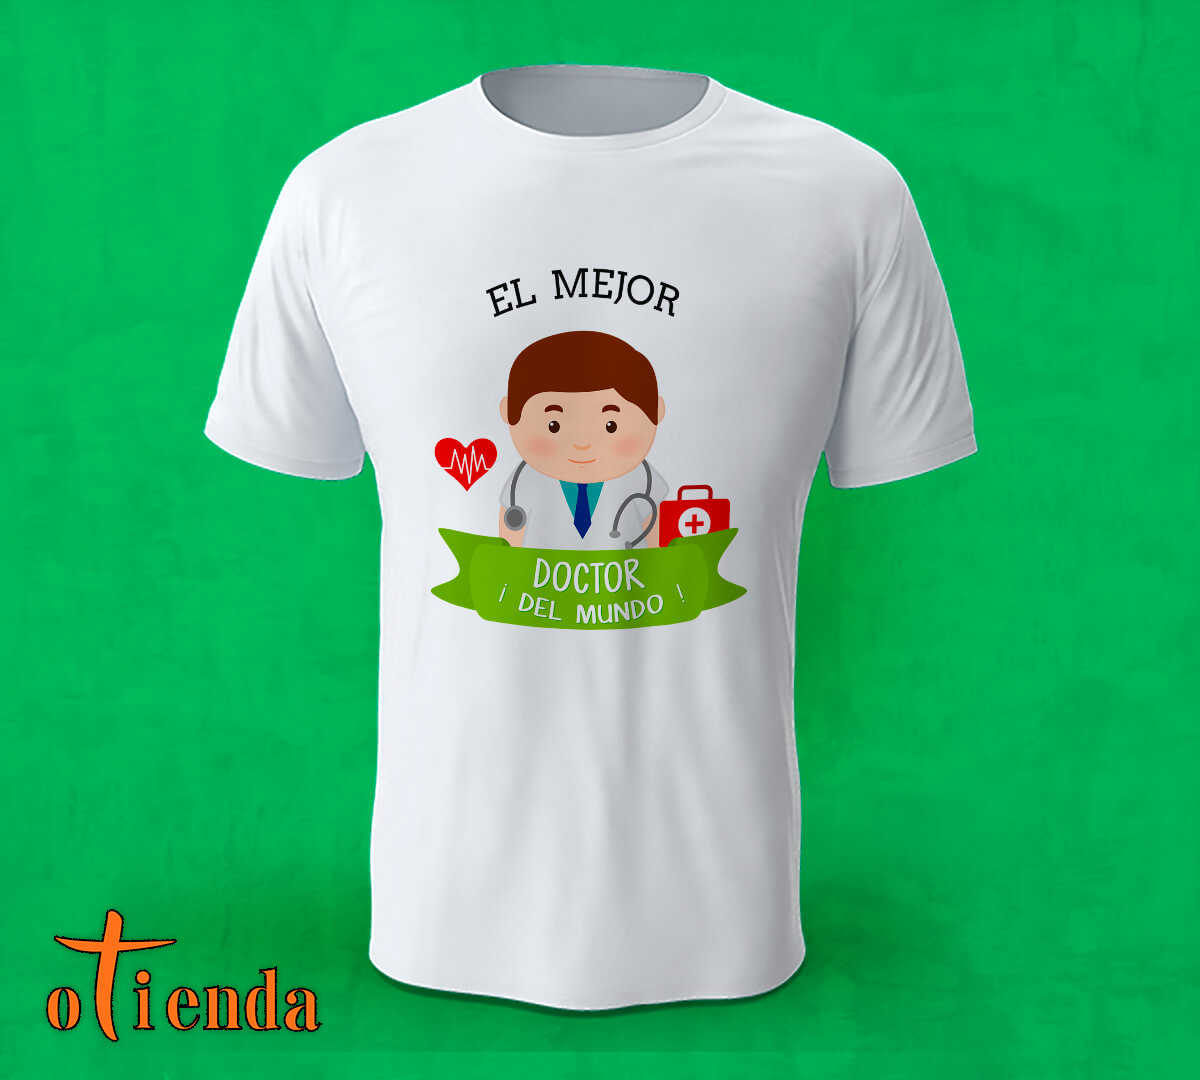 Camiseta El Mejor personaliz